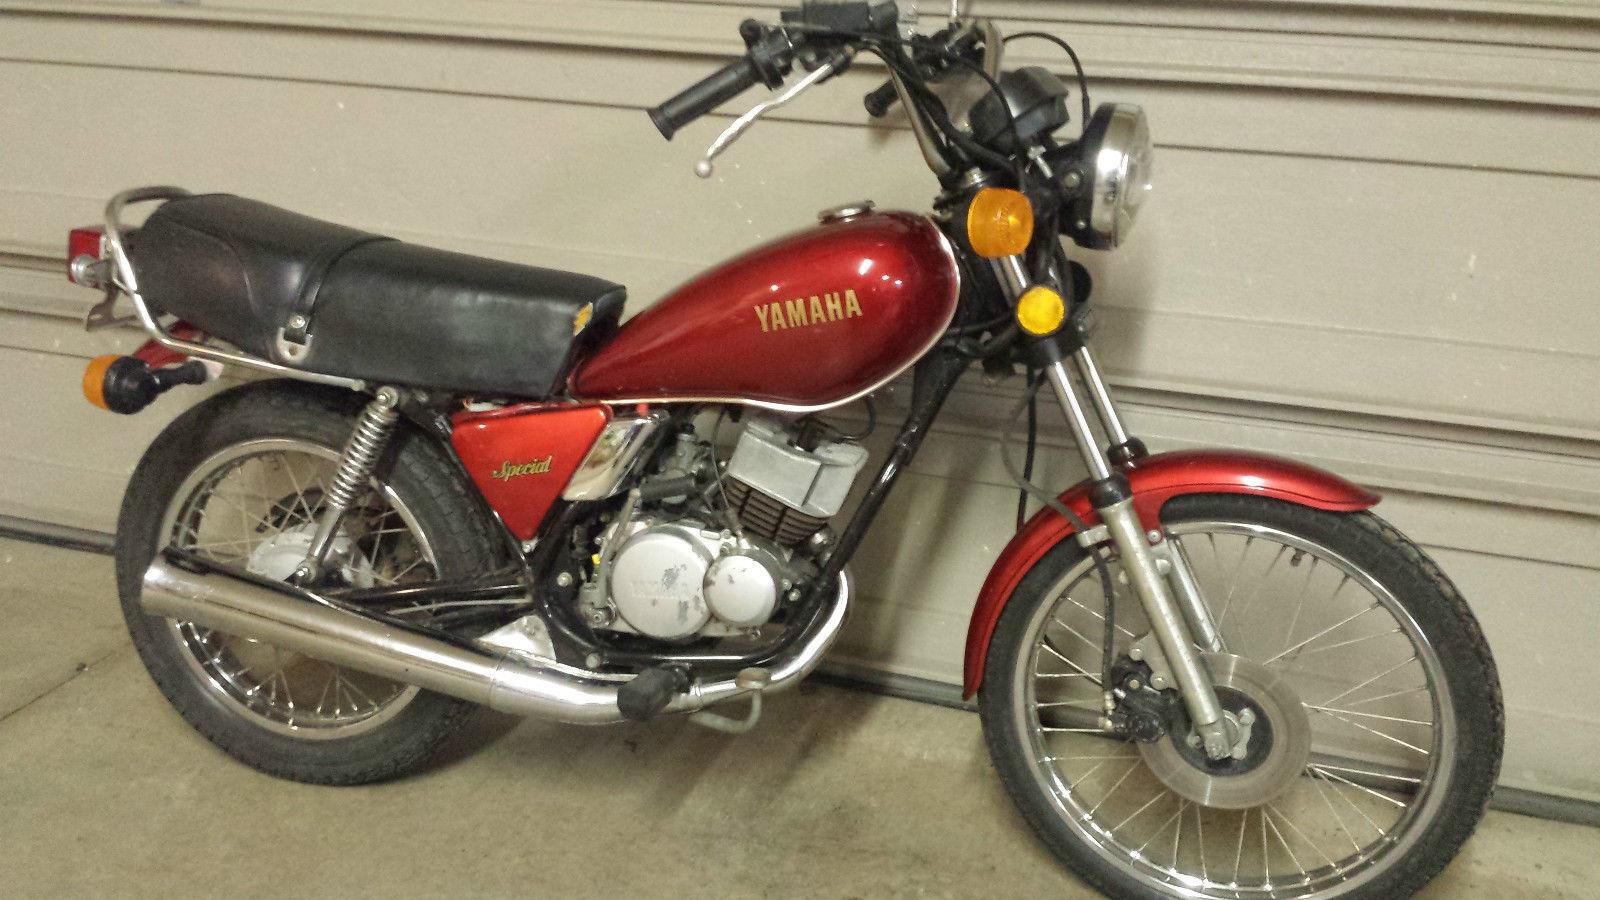 1982 Yamaha RX50 2 Stroke Motorcycle 49cc Street Bike YSR ...